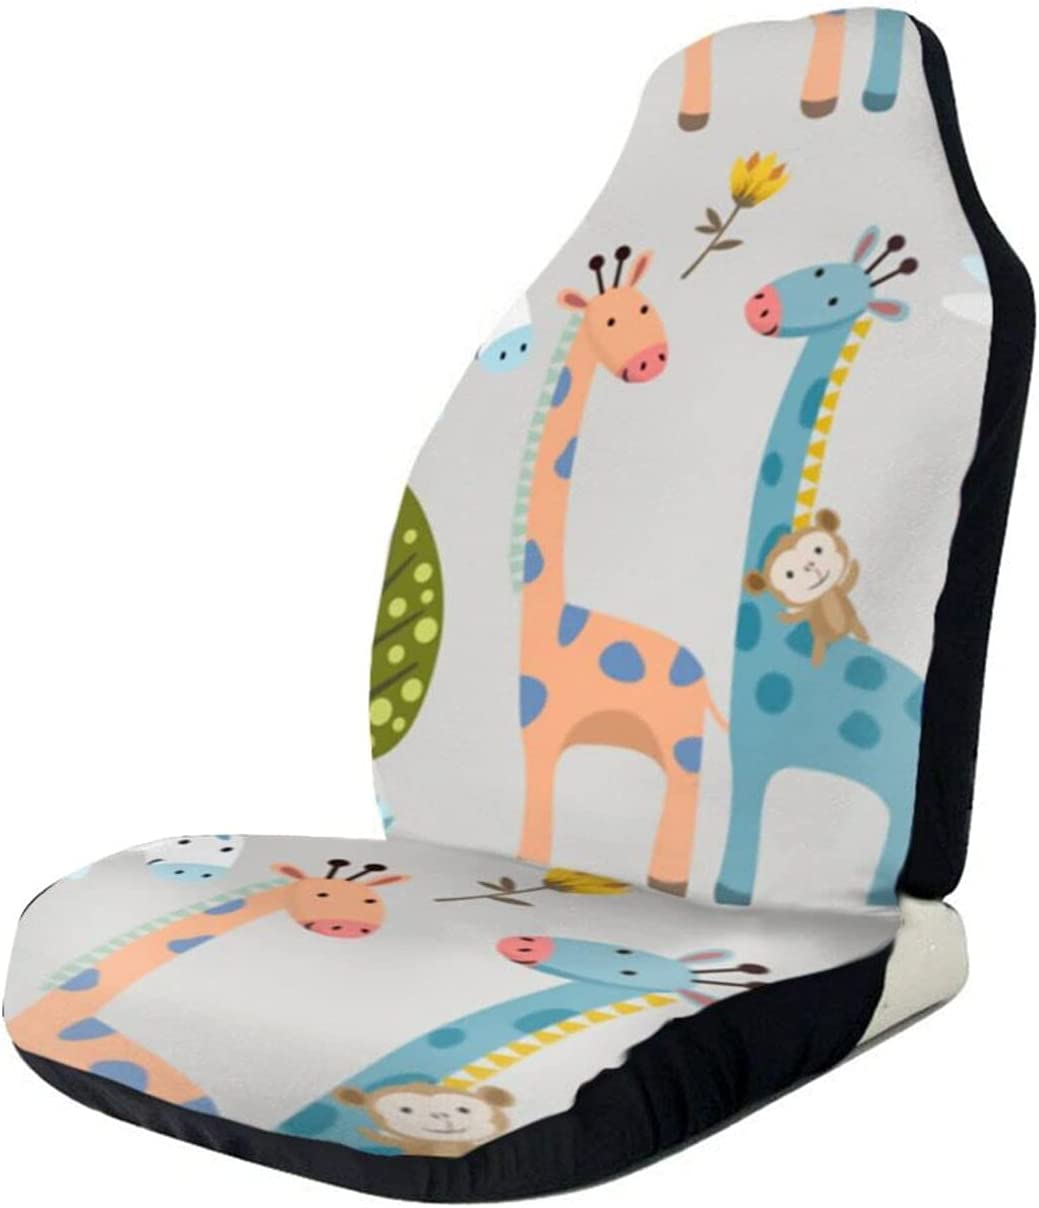 KSDRJWQ Cartoon trend rank Giraffe 2021 new Zebra and Covers Forest Seat Car Monkey